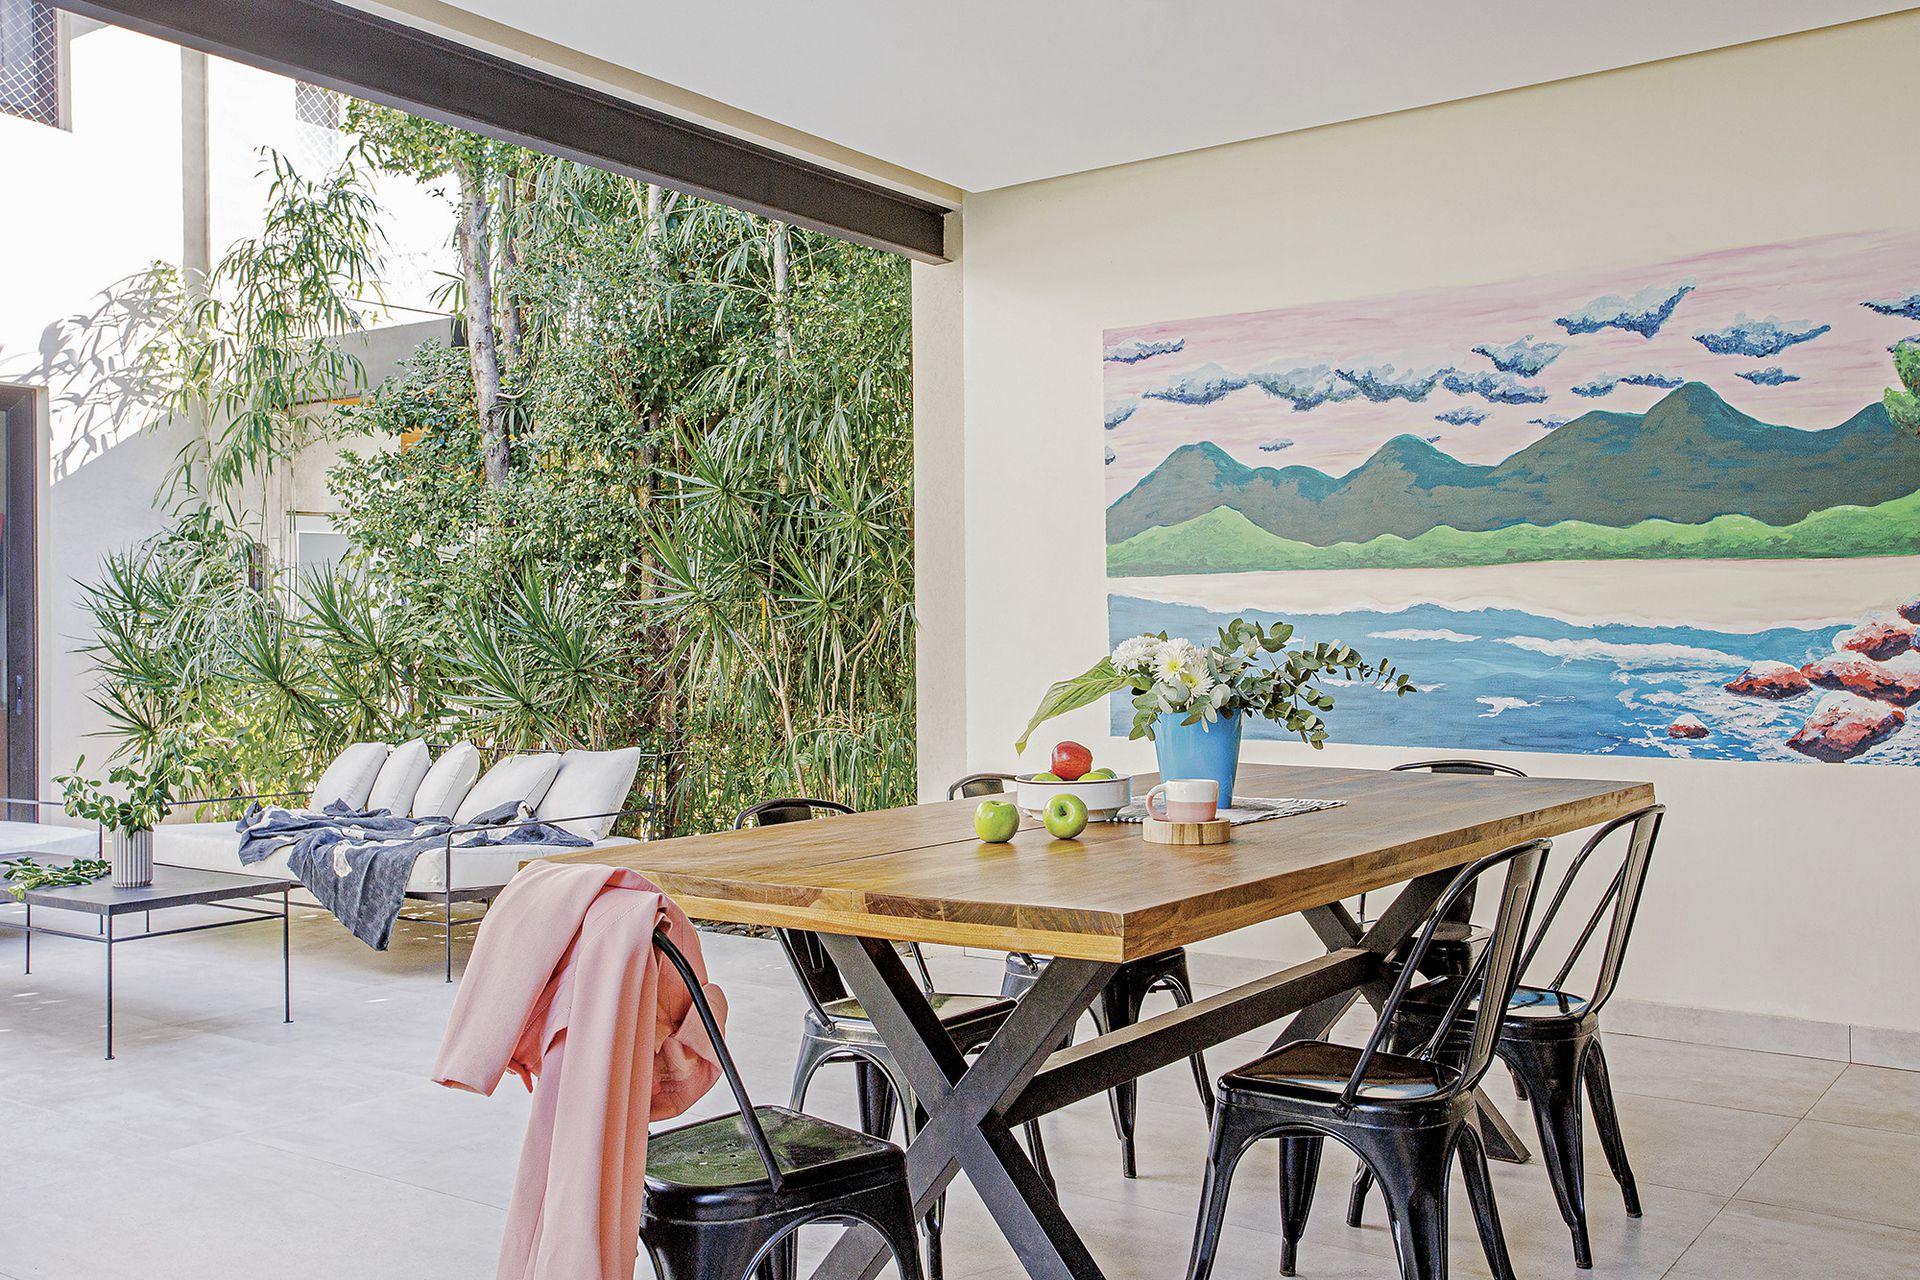 Mesa de lapacho (Crudo Home) rodeada de sillas 'Tólix'. Mural realizado por Michel Fassi (Eileen Vergez, asesoramiento de arte).